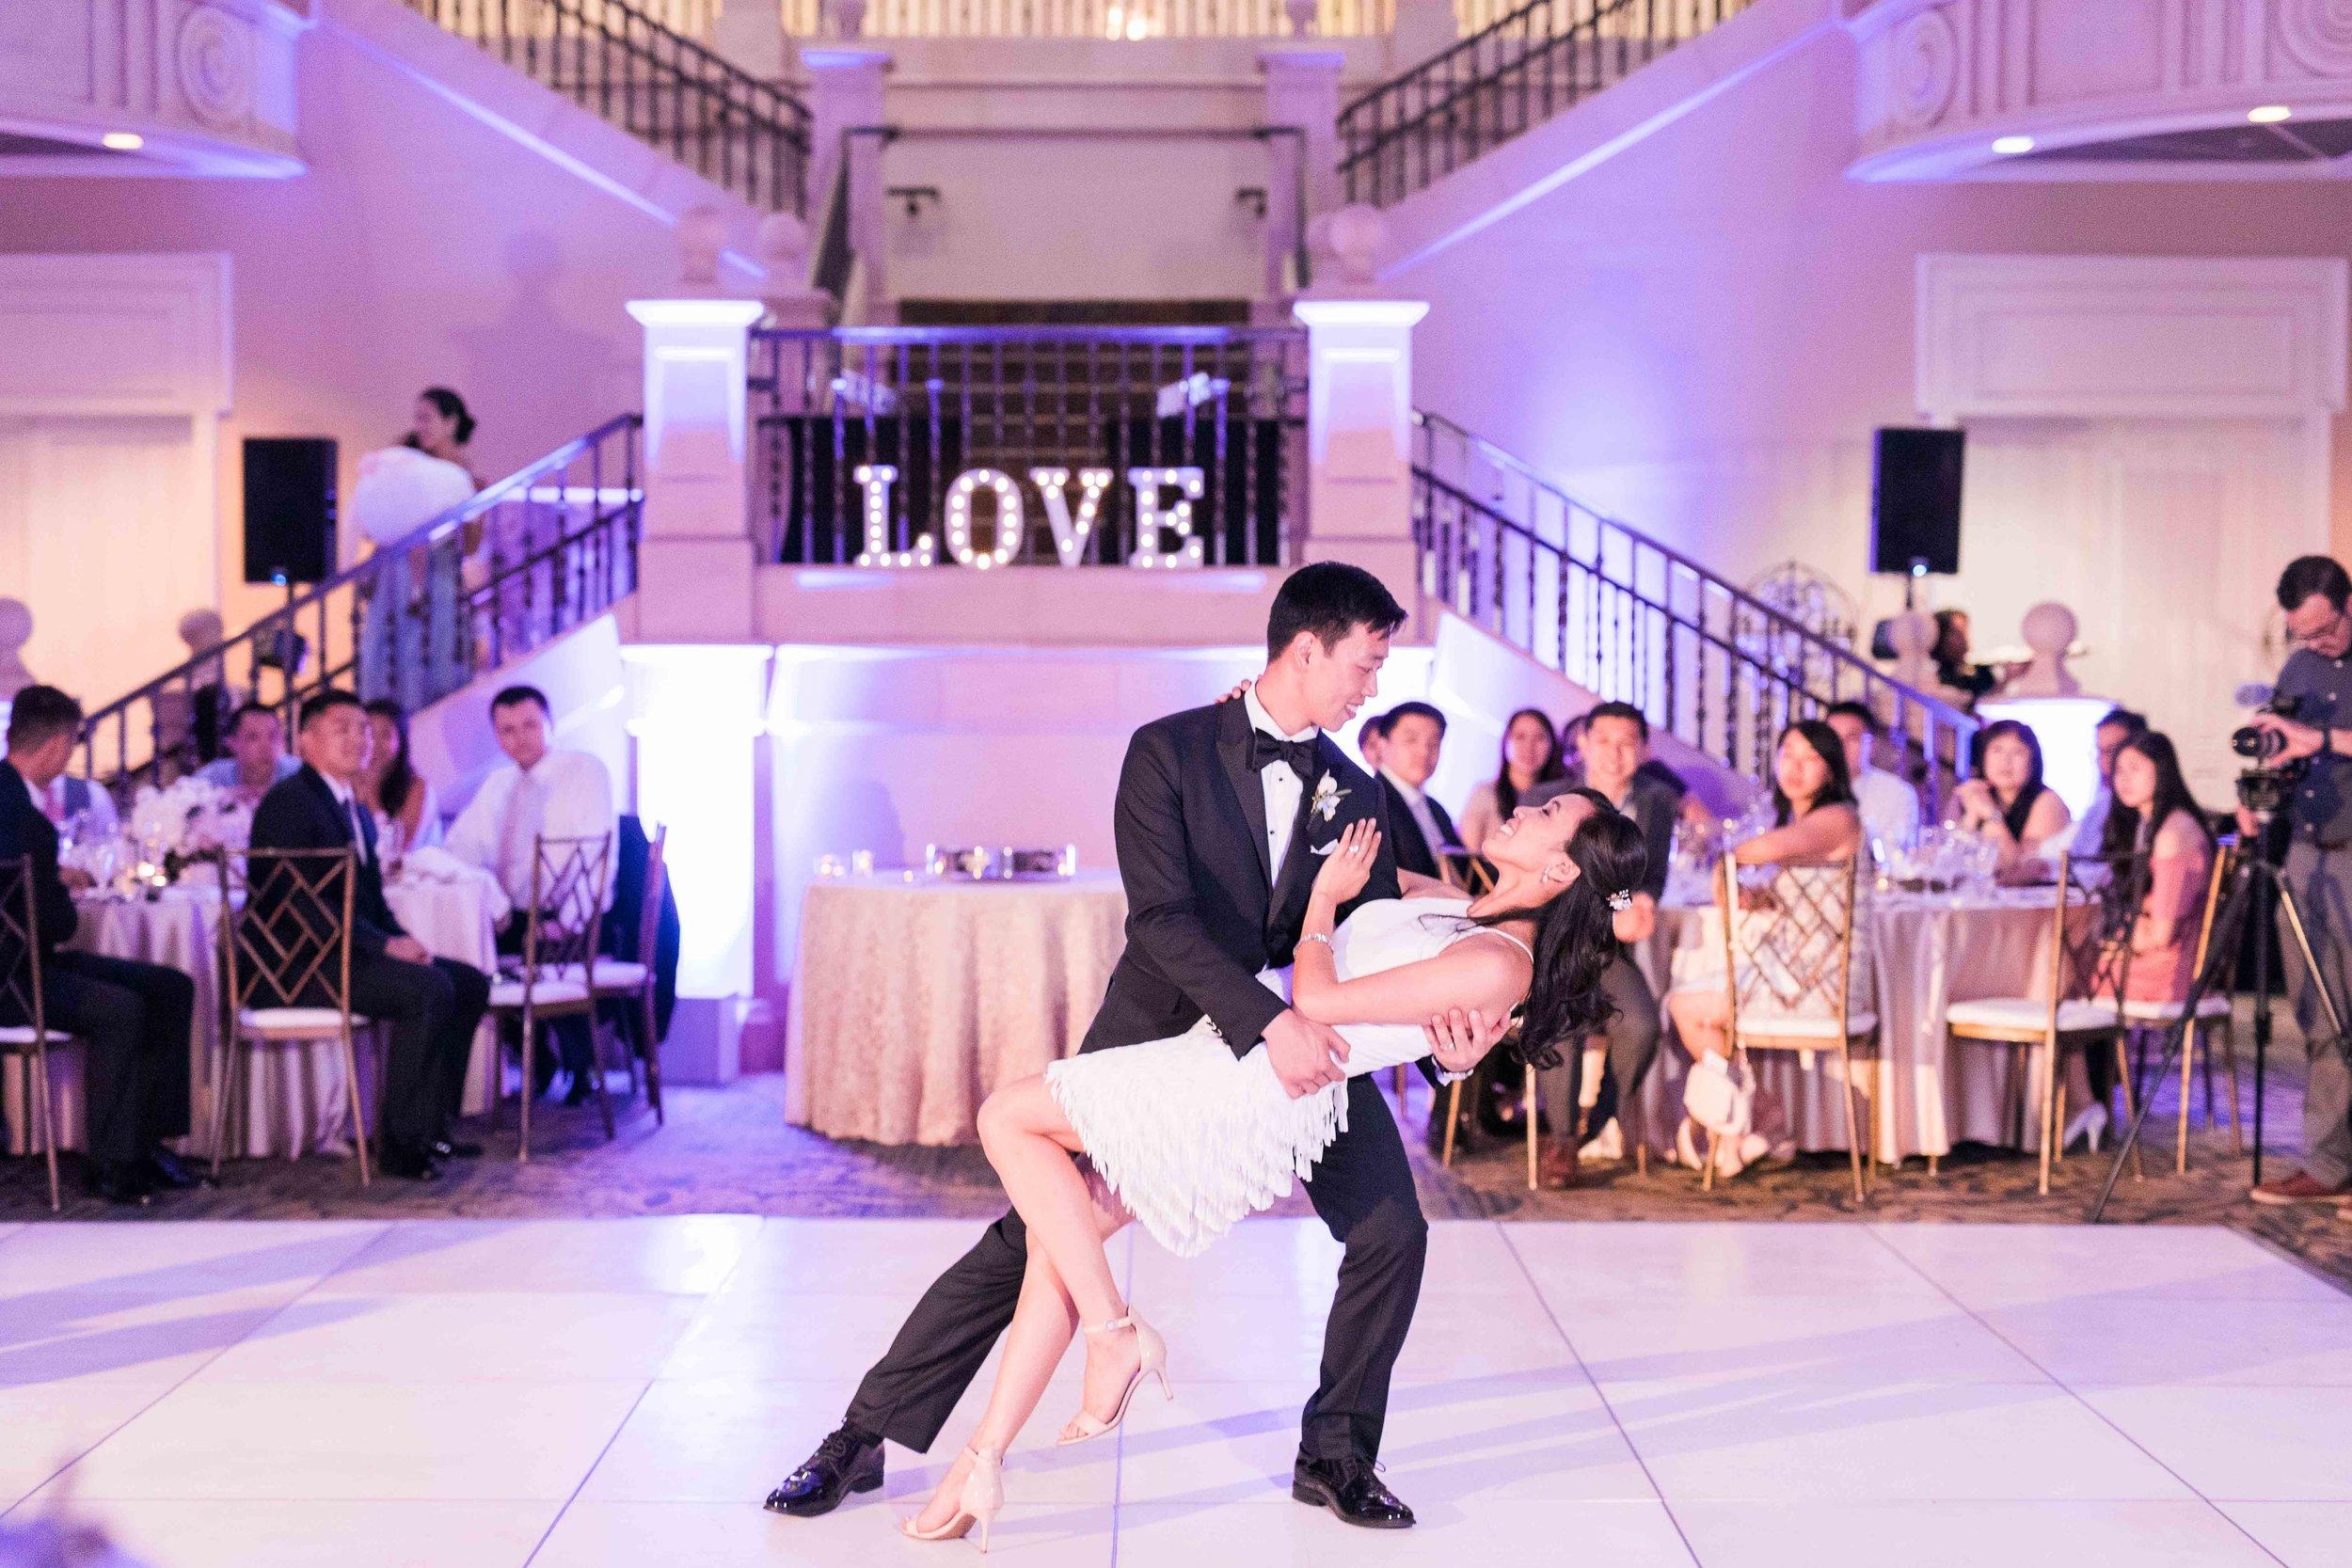 Ruby Hill Wedding Photos by JBJ Pictures - San Francisco Wedding Photographer - Pleasanton Wedding Venue (80).jpg